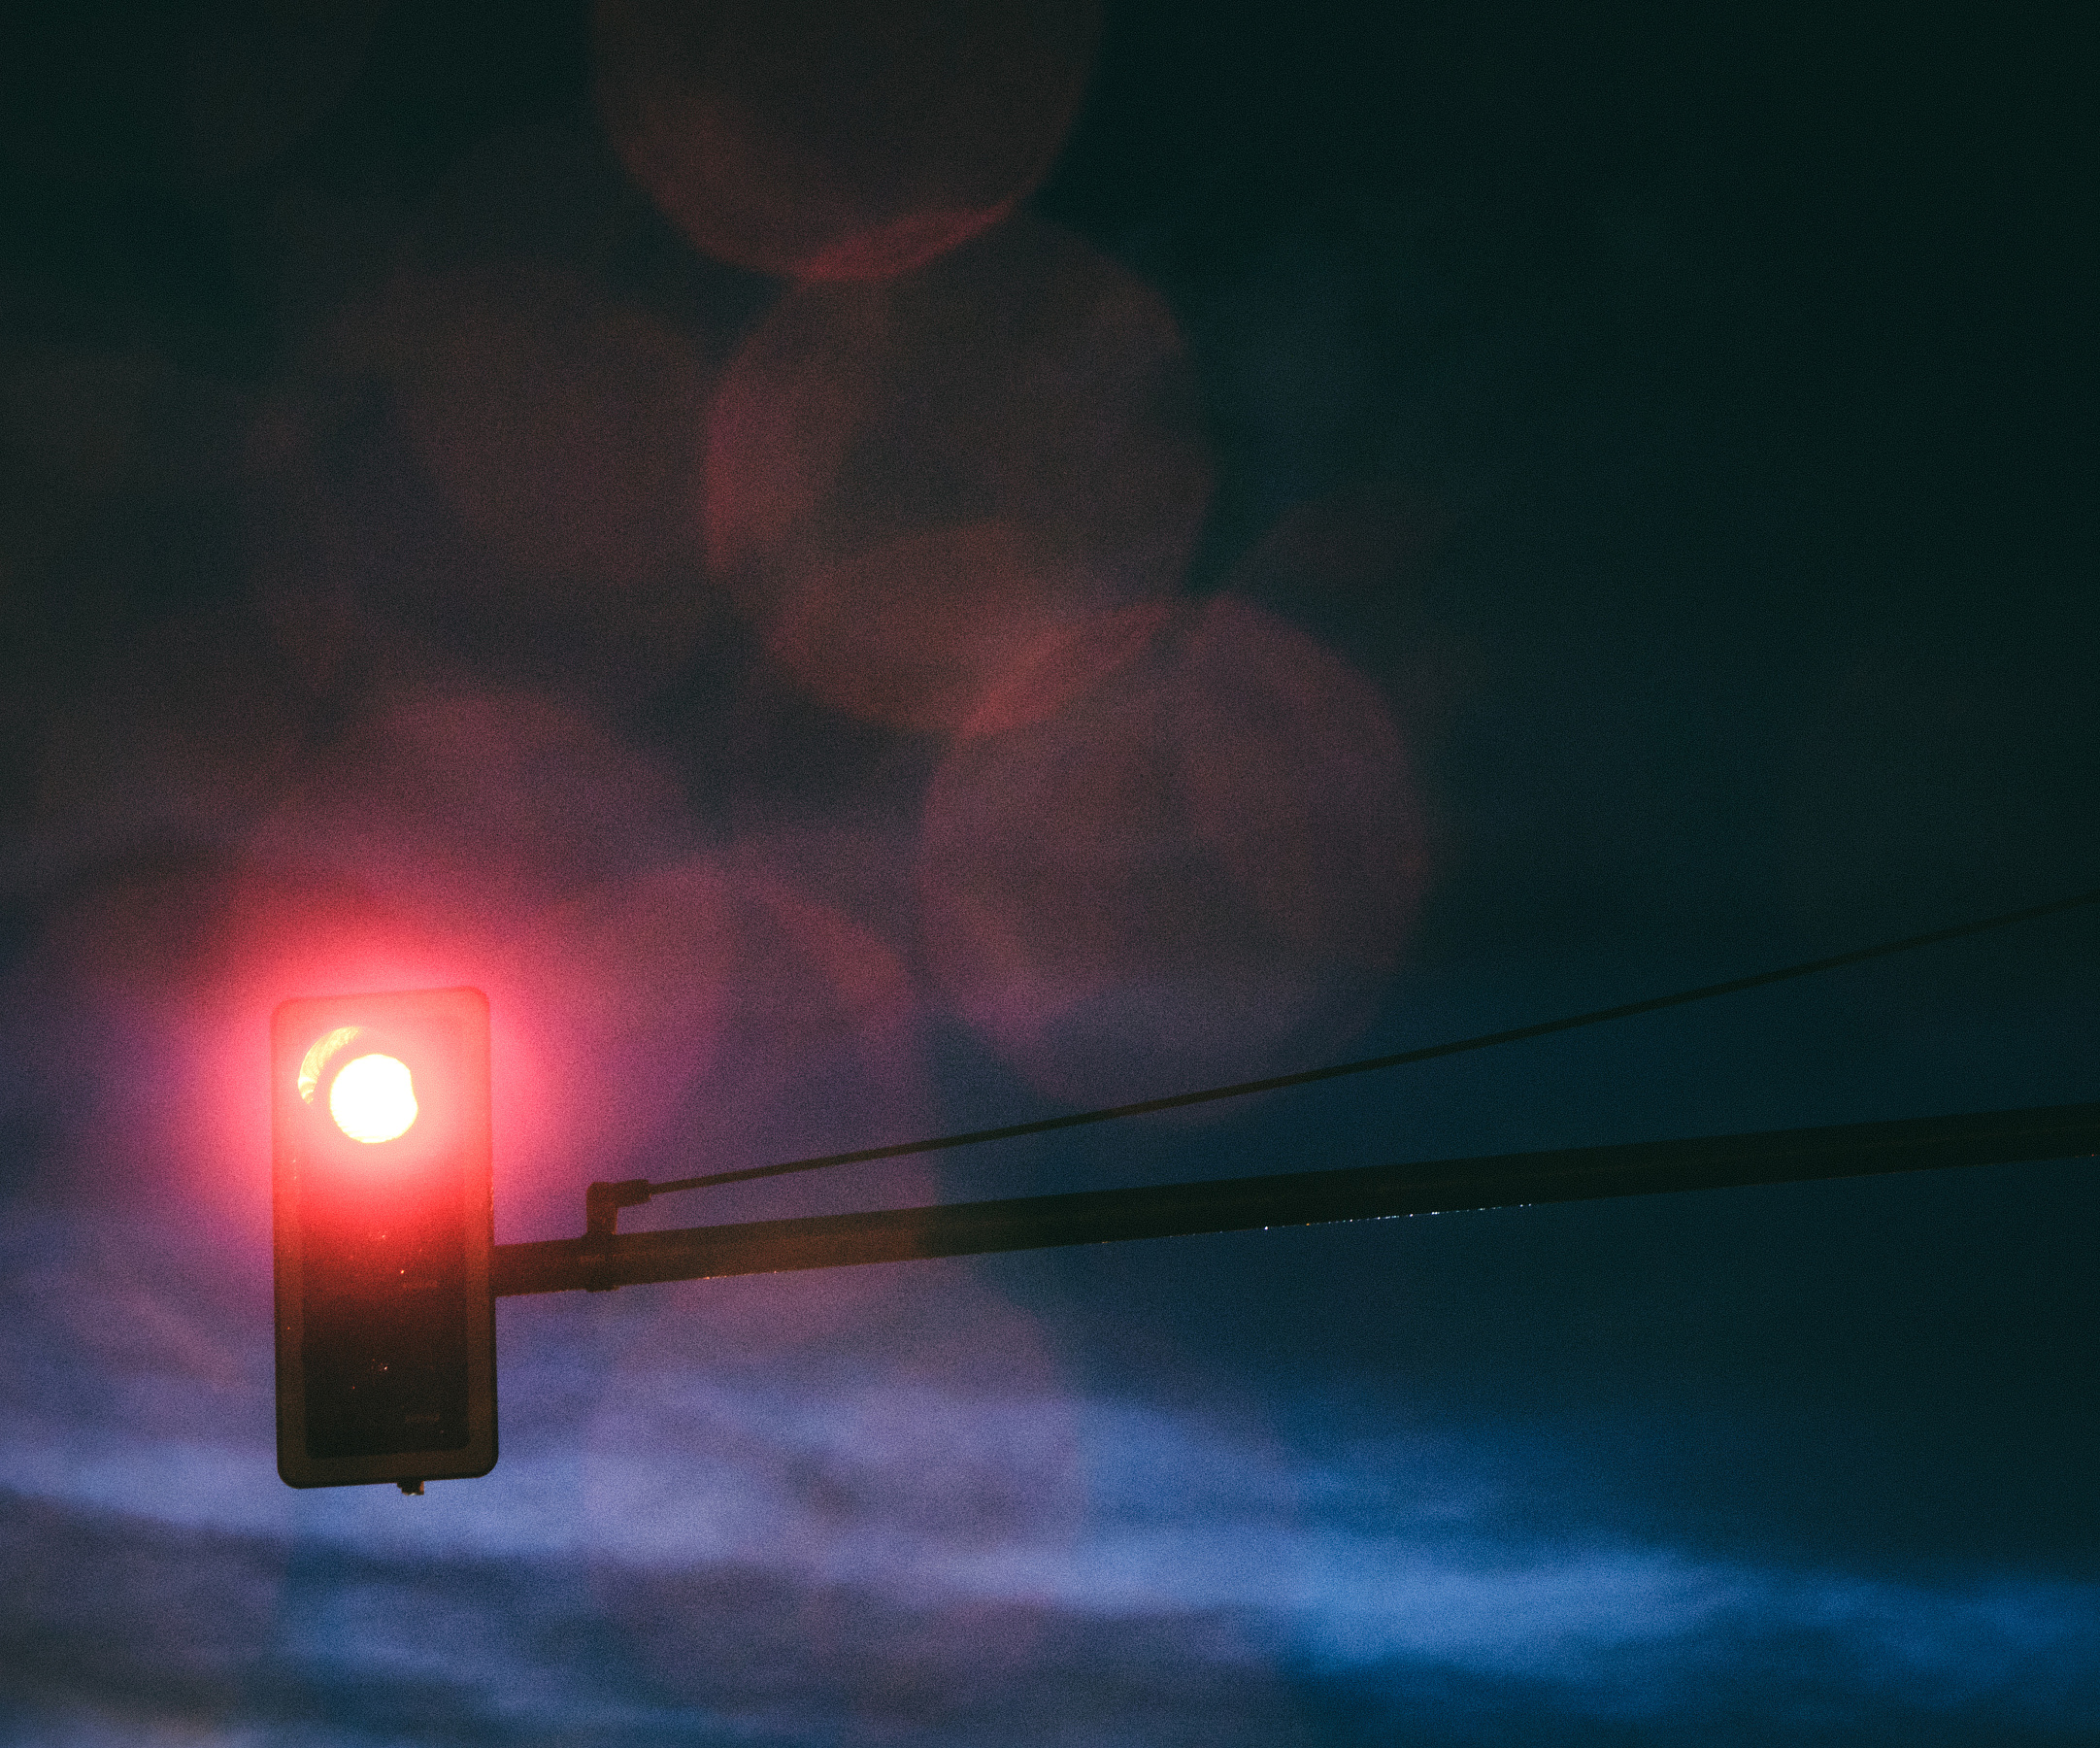 Red light at night